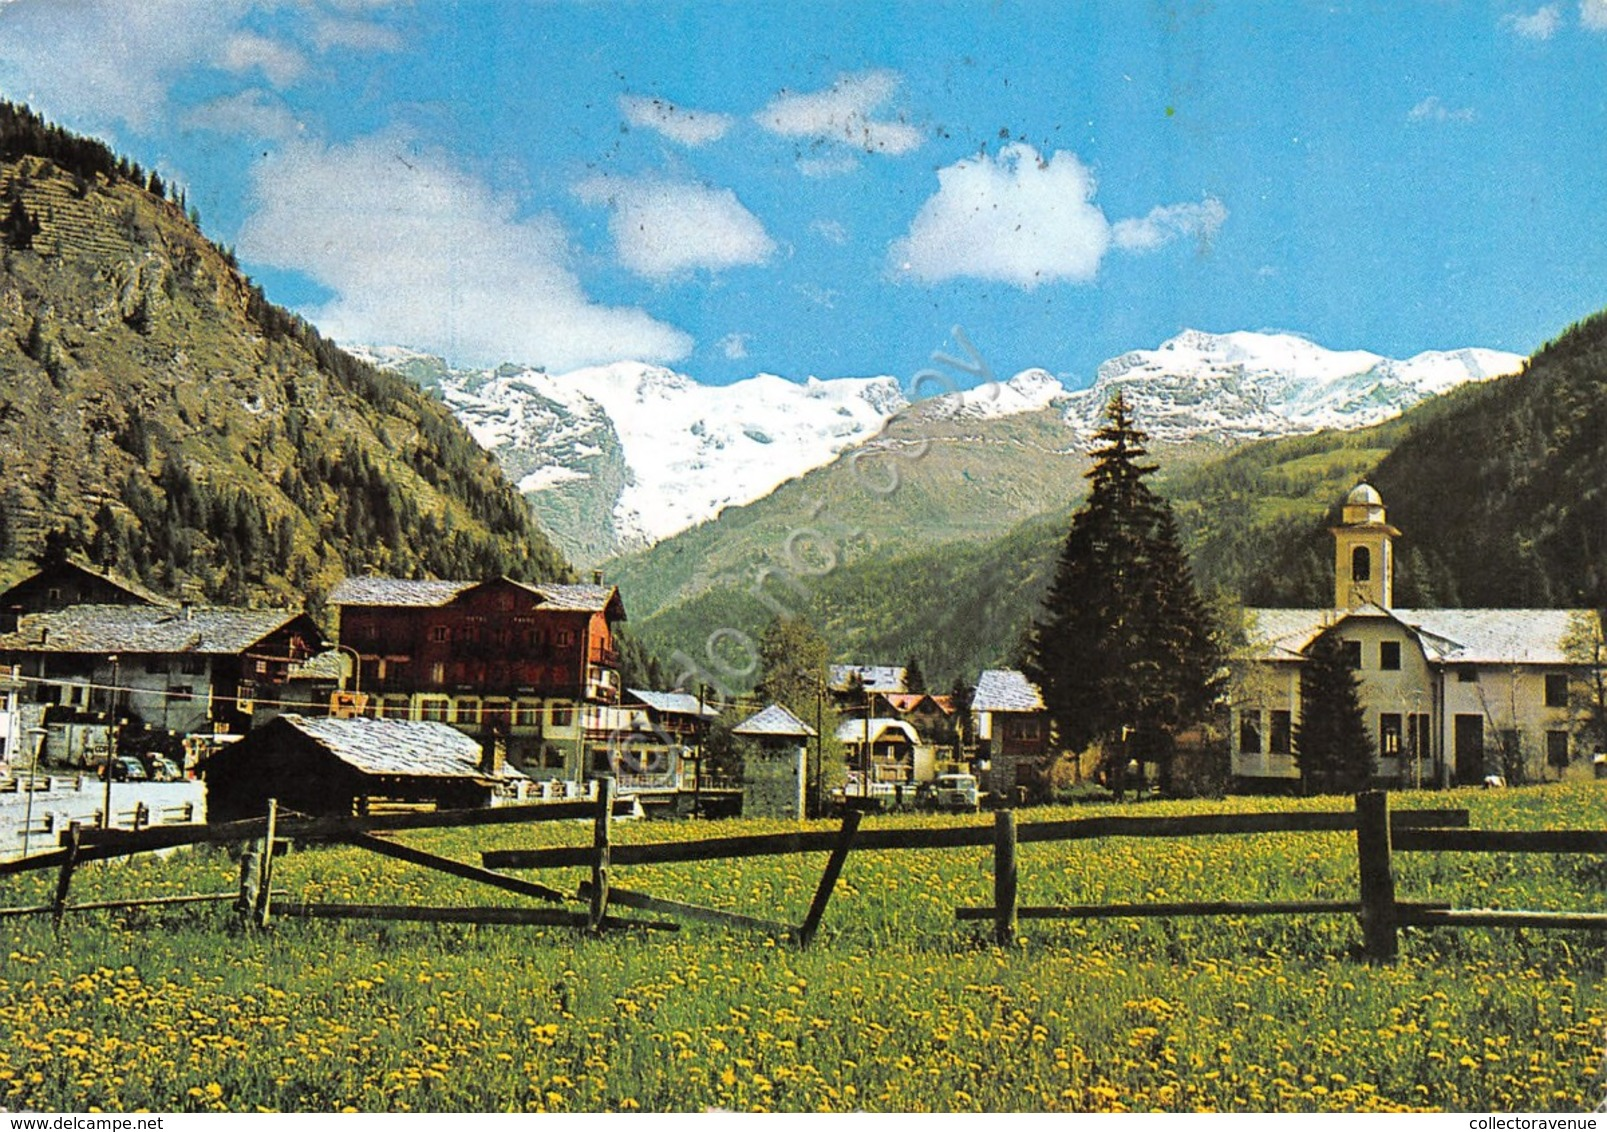 Cartolina Champoluc Panorama Parziale 1973 Timbro 113 - Italy